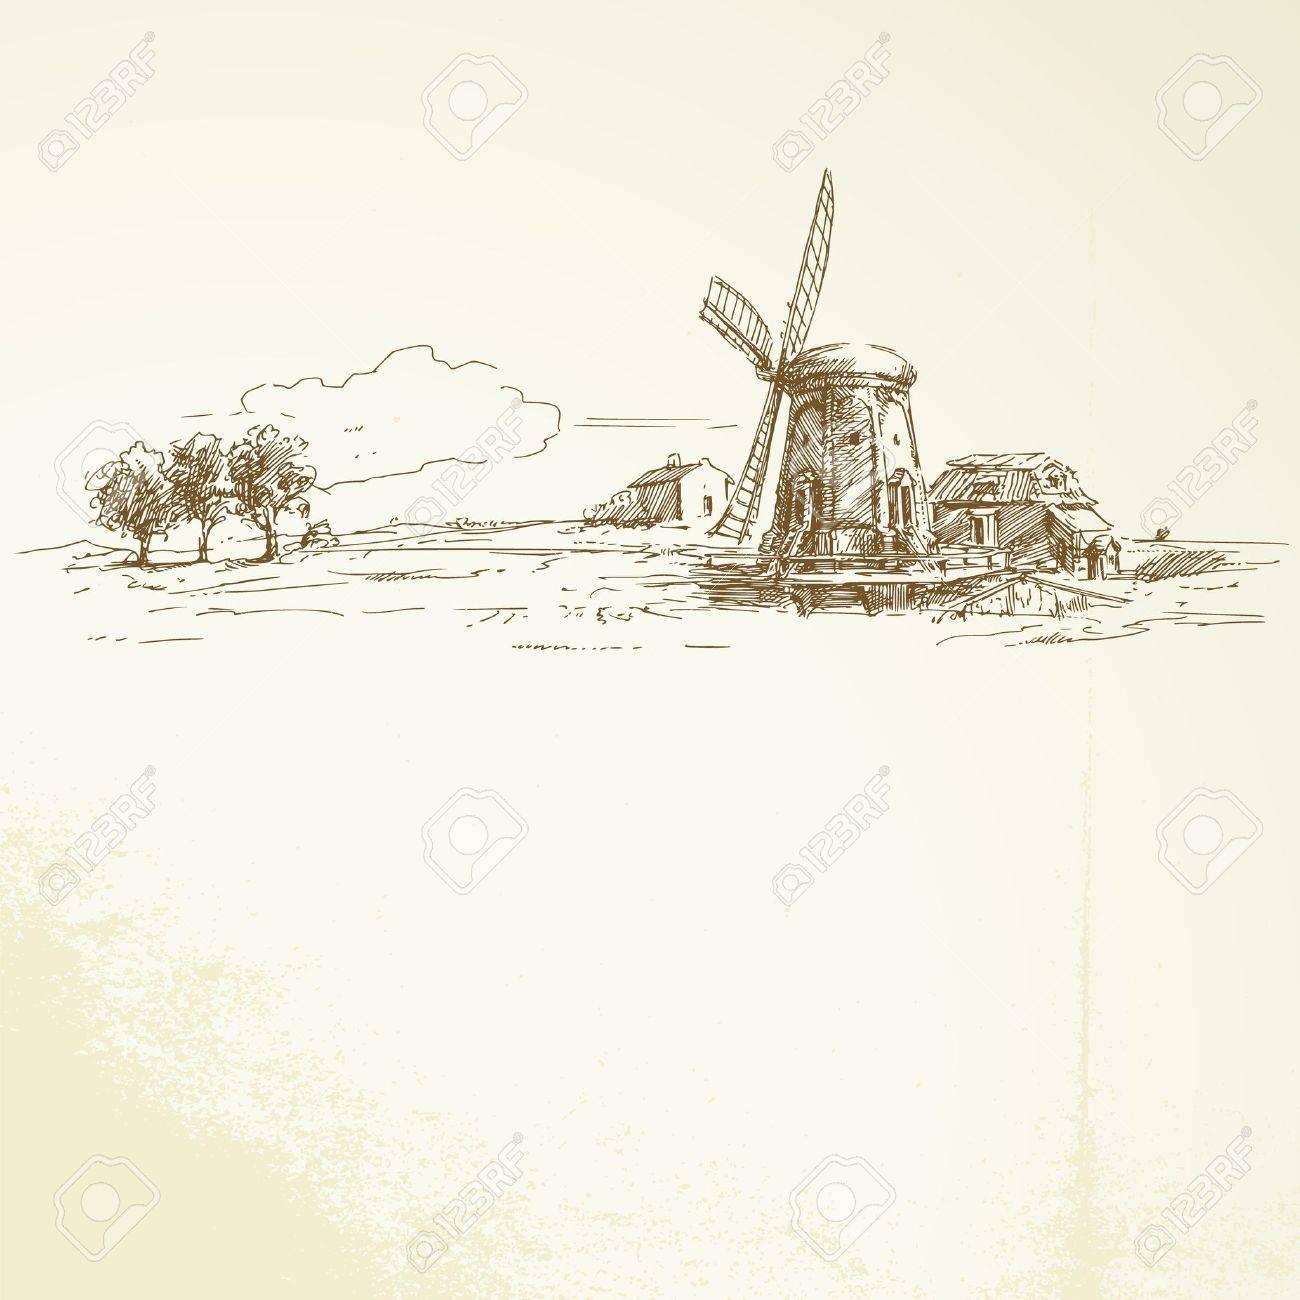 holland windmill - hand drawn illustration Stock Vector - 14234284